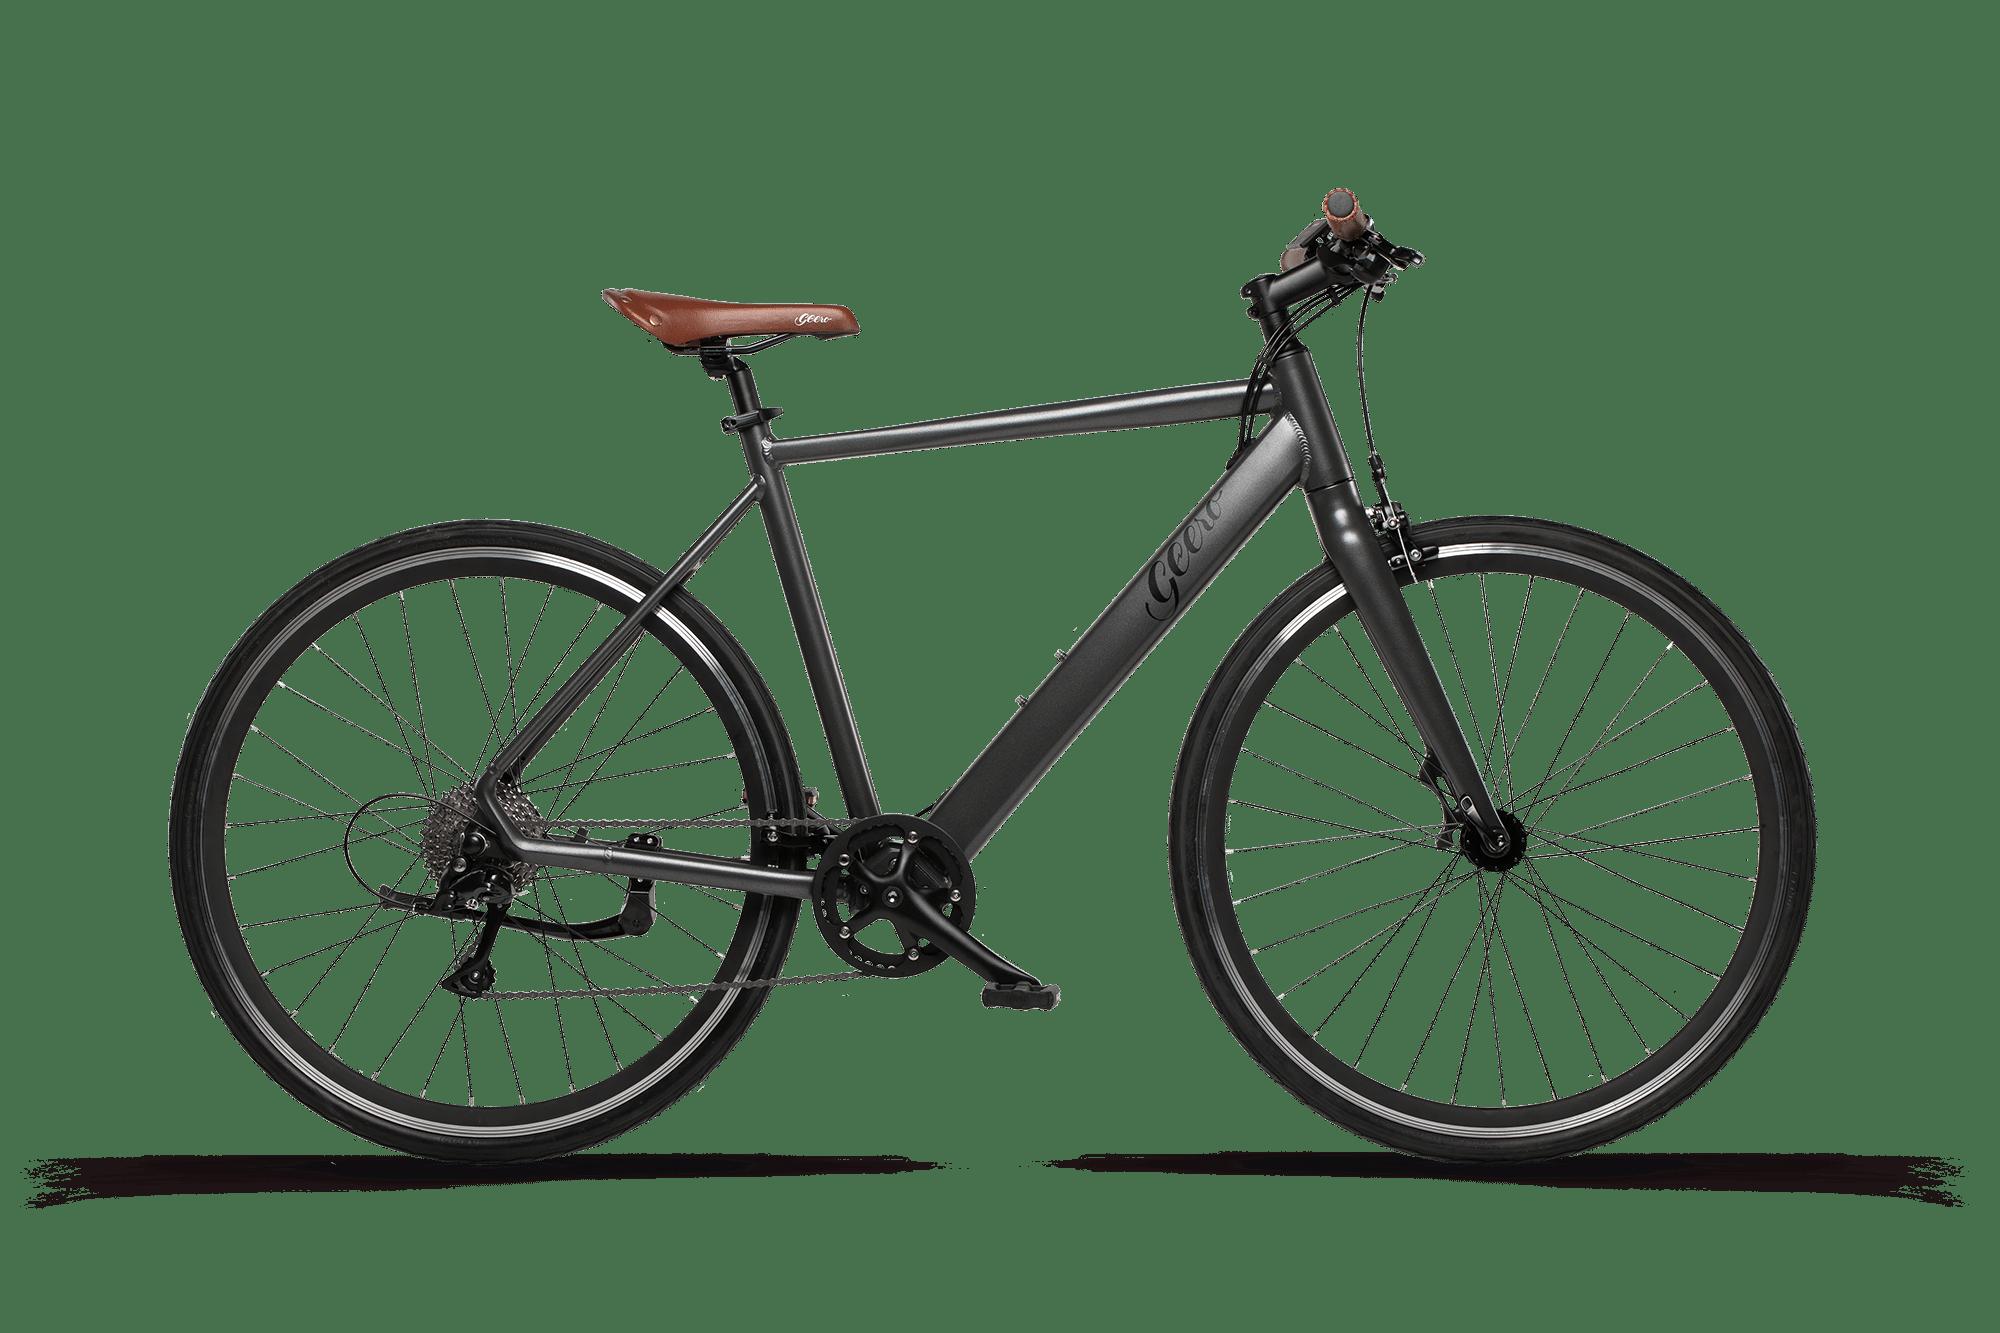 GEERO 1 E-Bike Original-Classic - eBikeNews